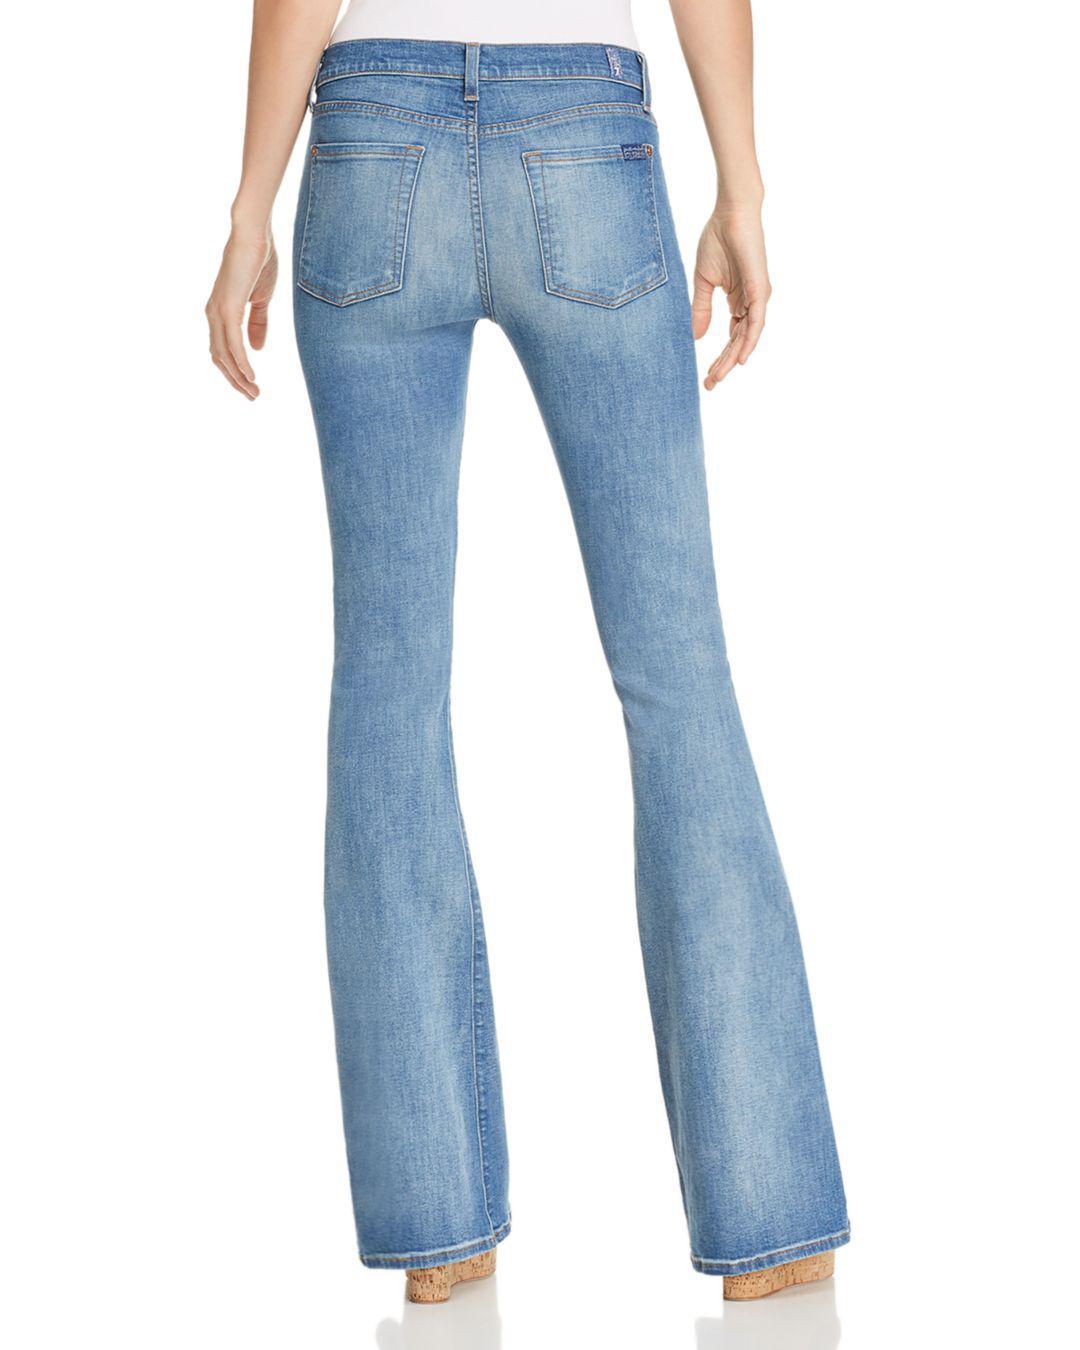 7 For All Mankind Denim Ali Flare Jeans In Heritage Artwalk in Blue